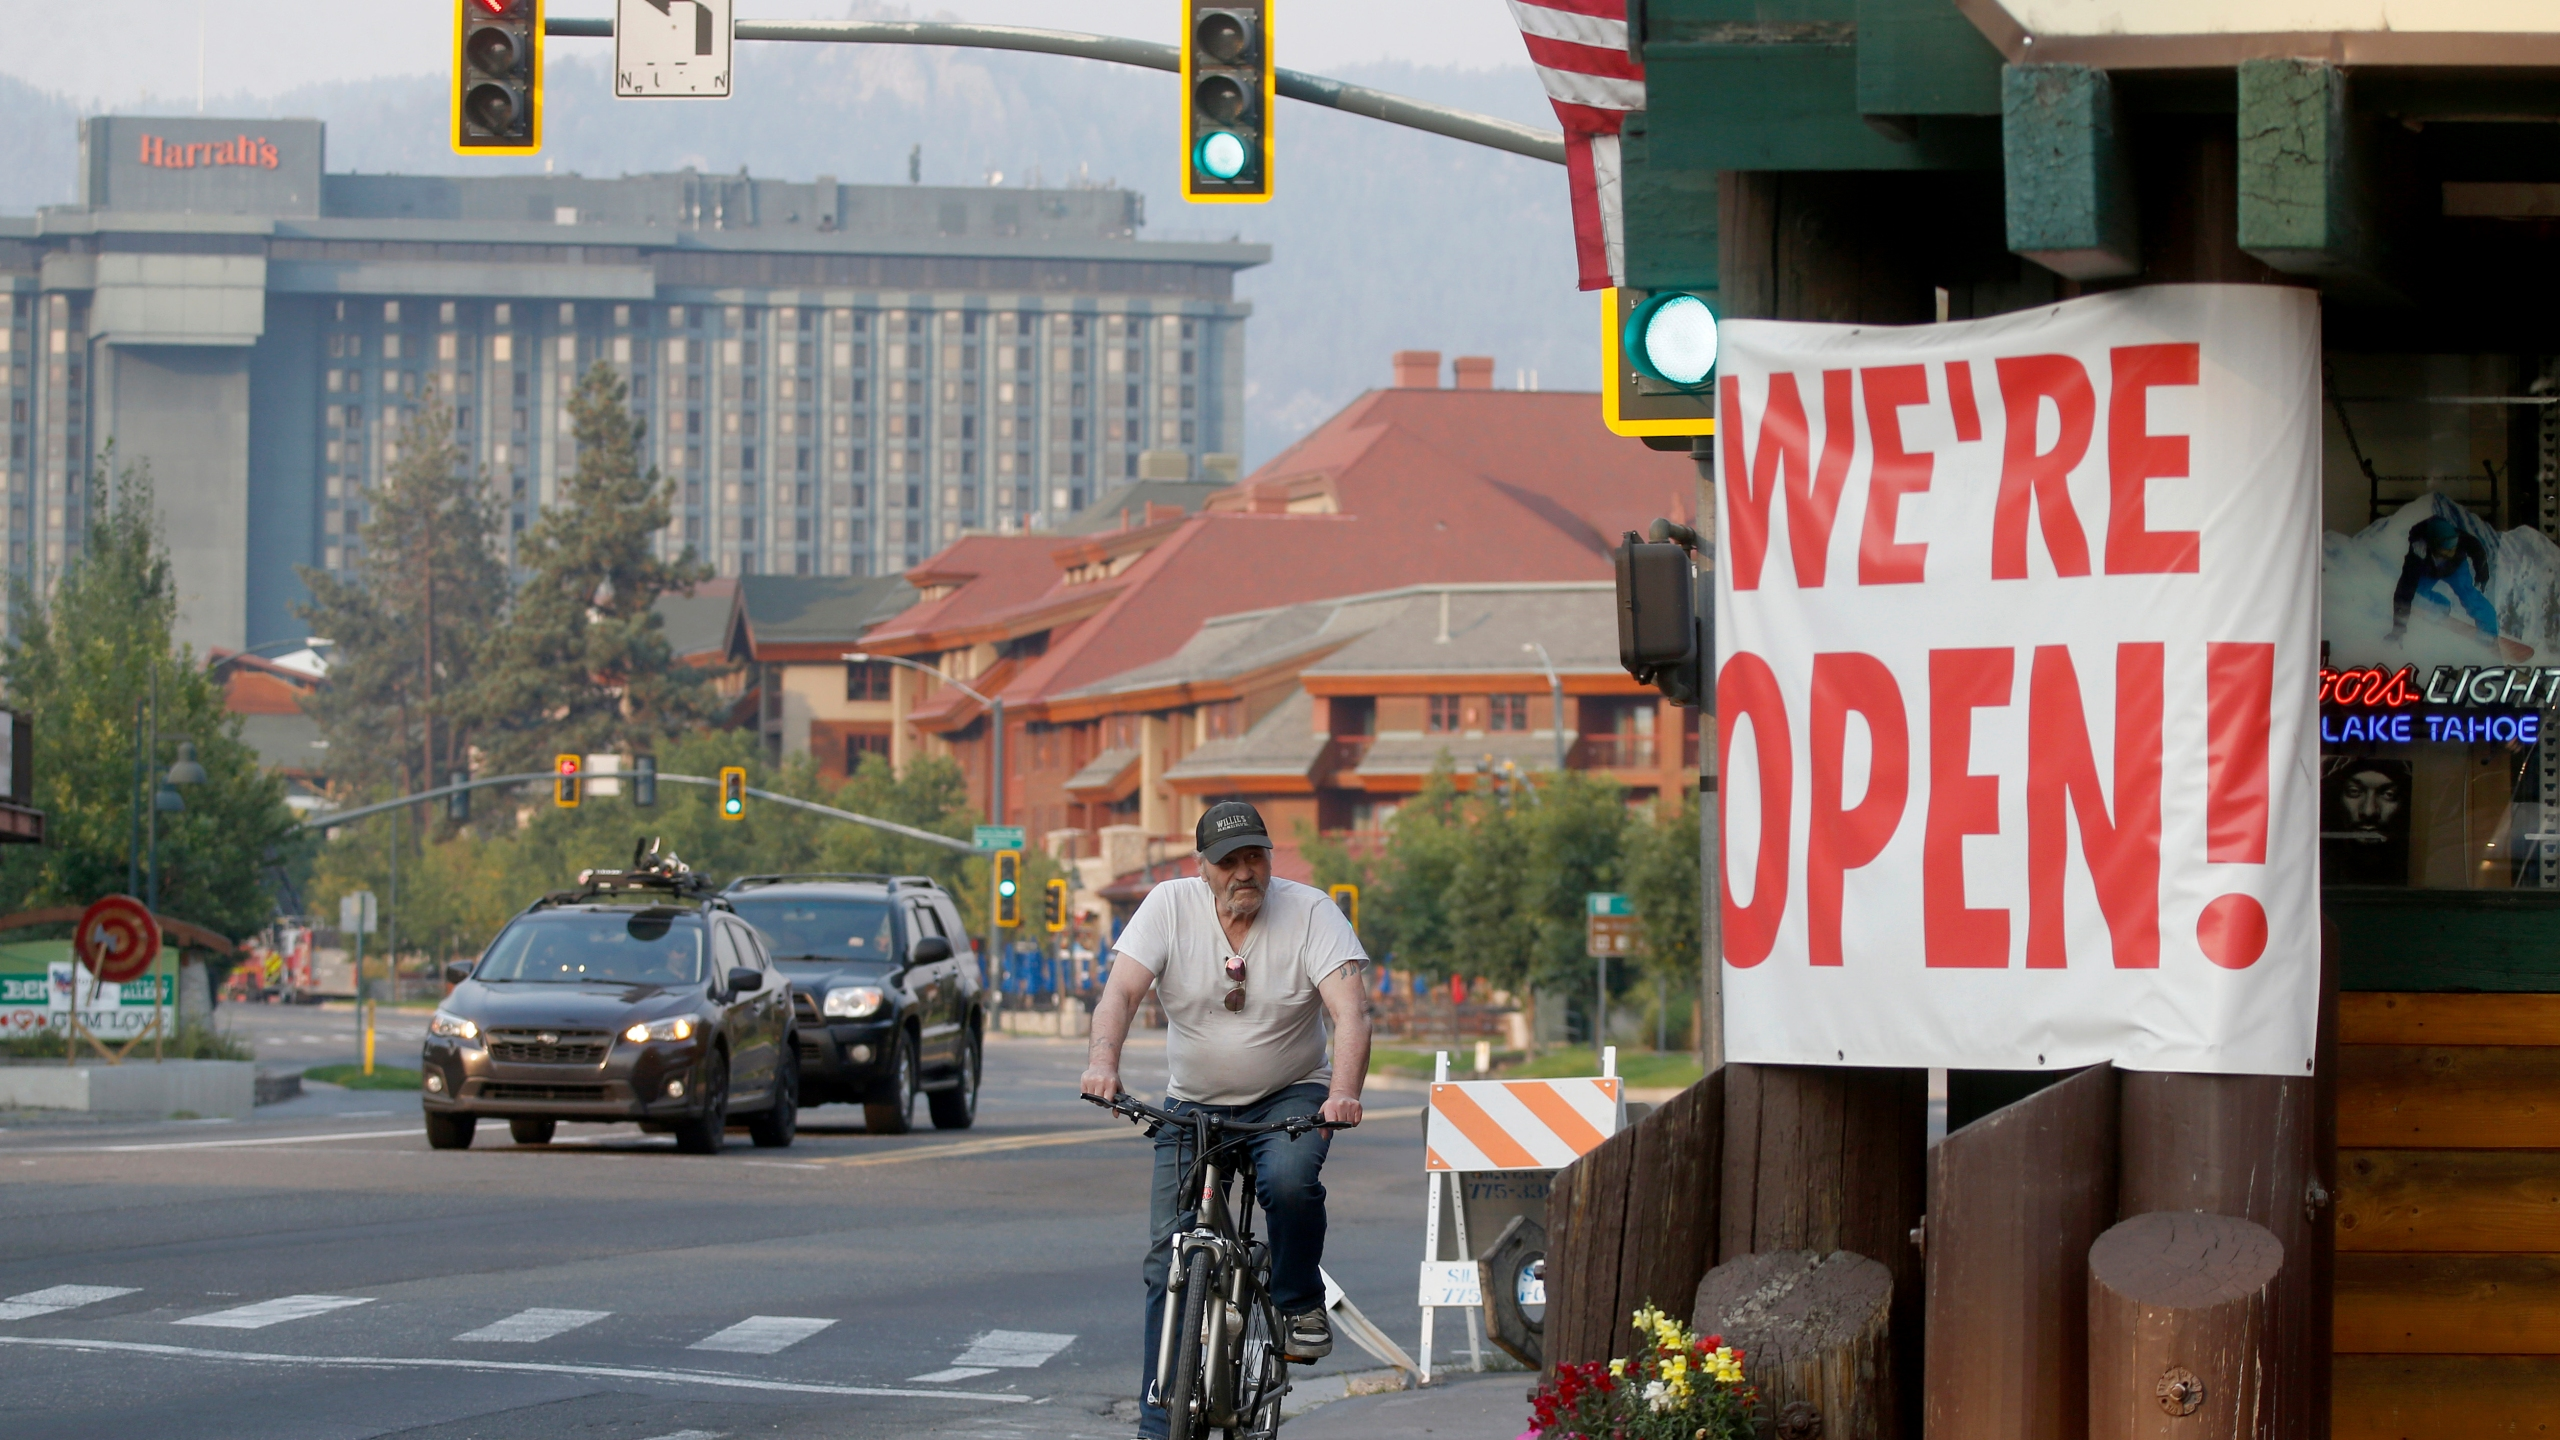 Traffic flows along Highway 50 near Stateline, Nev., as residents begin to return to South Lake Tahoe, Calif., on Sunday, Sept. 5, 2021. (Jane Tyska/Bay Area News Group via AP)